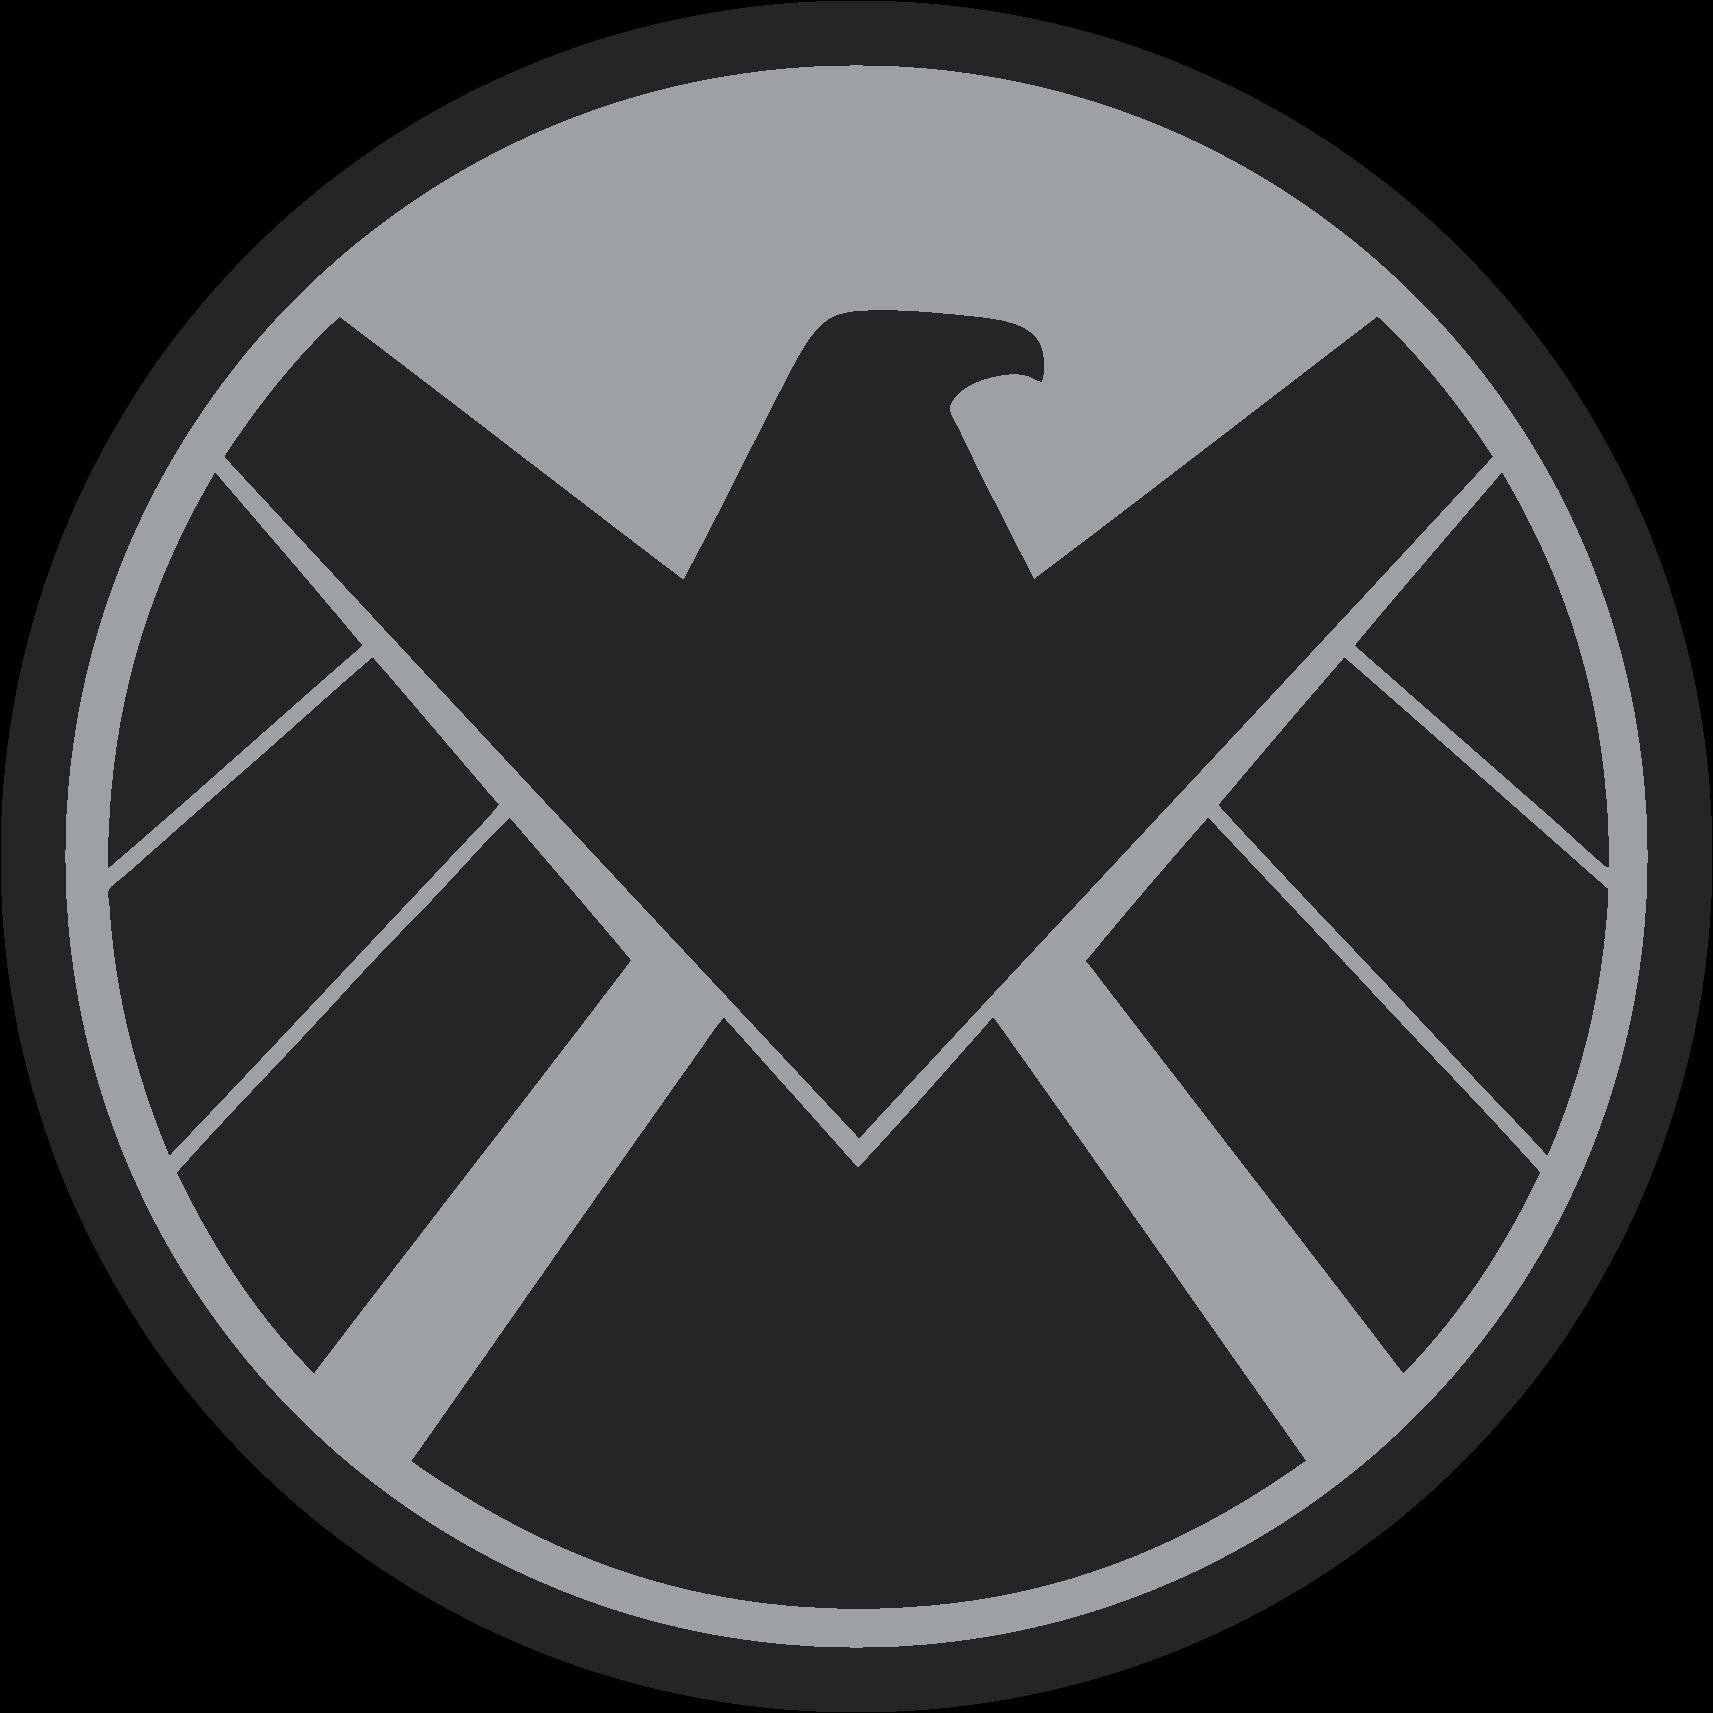 S.H.I.E.L.D. Civil War - Marvel Cinematic Universe Wiki